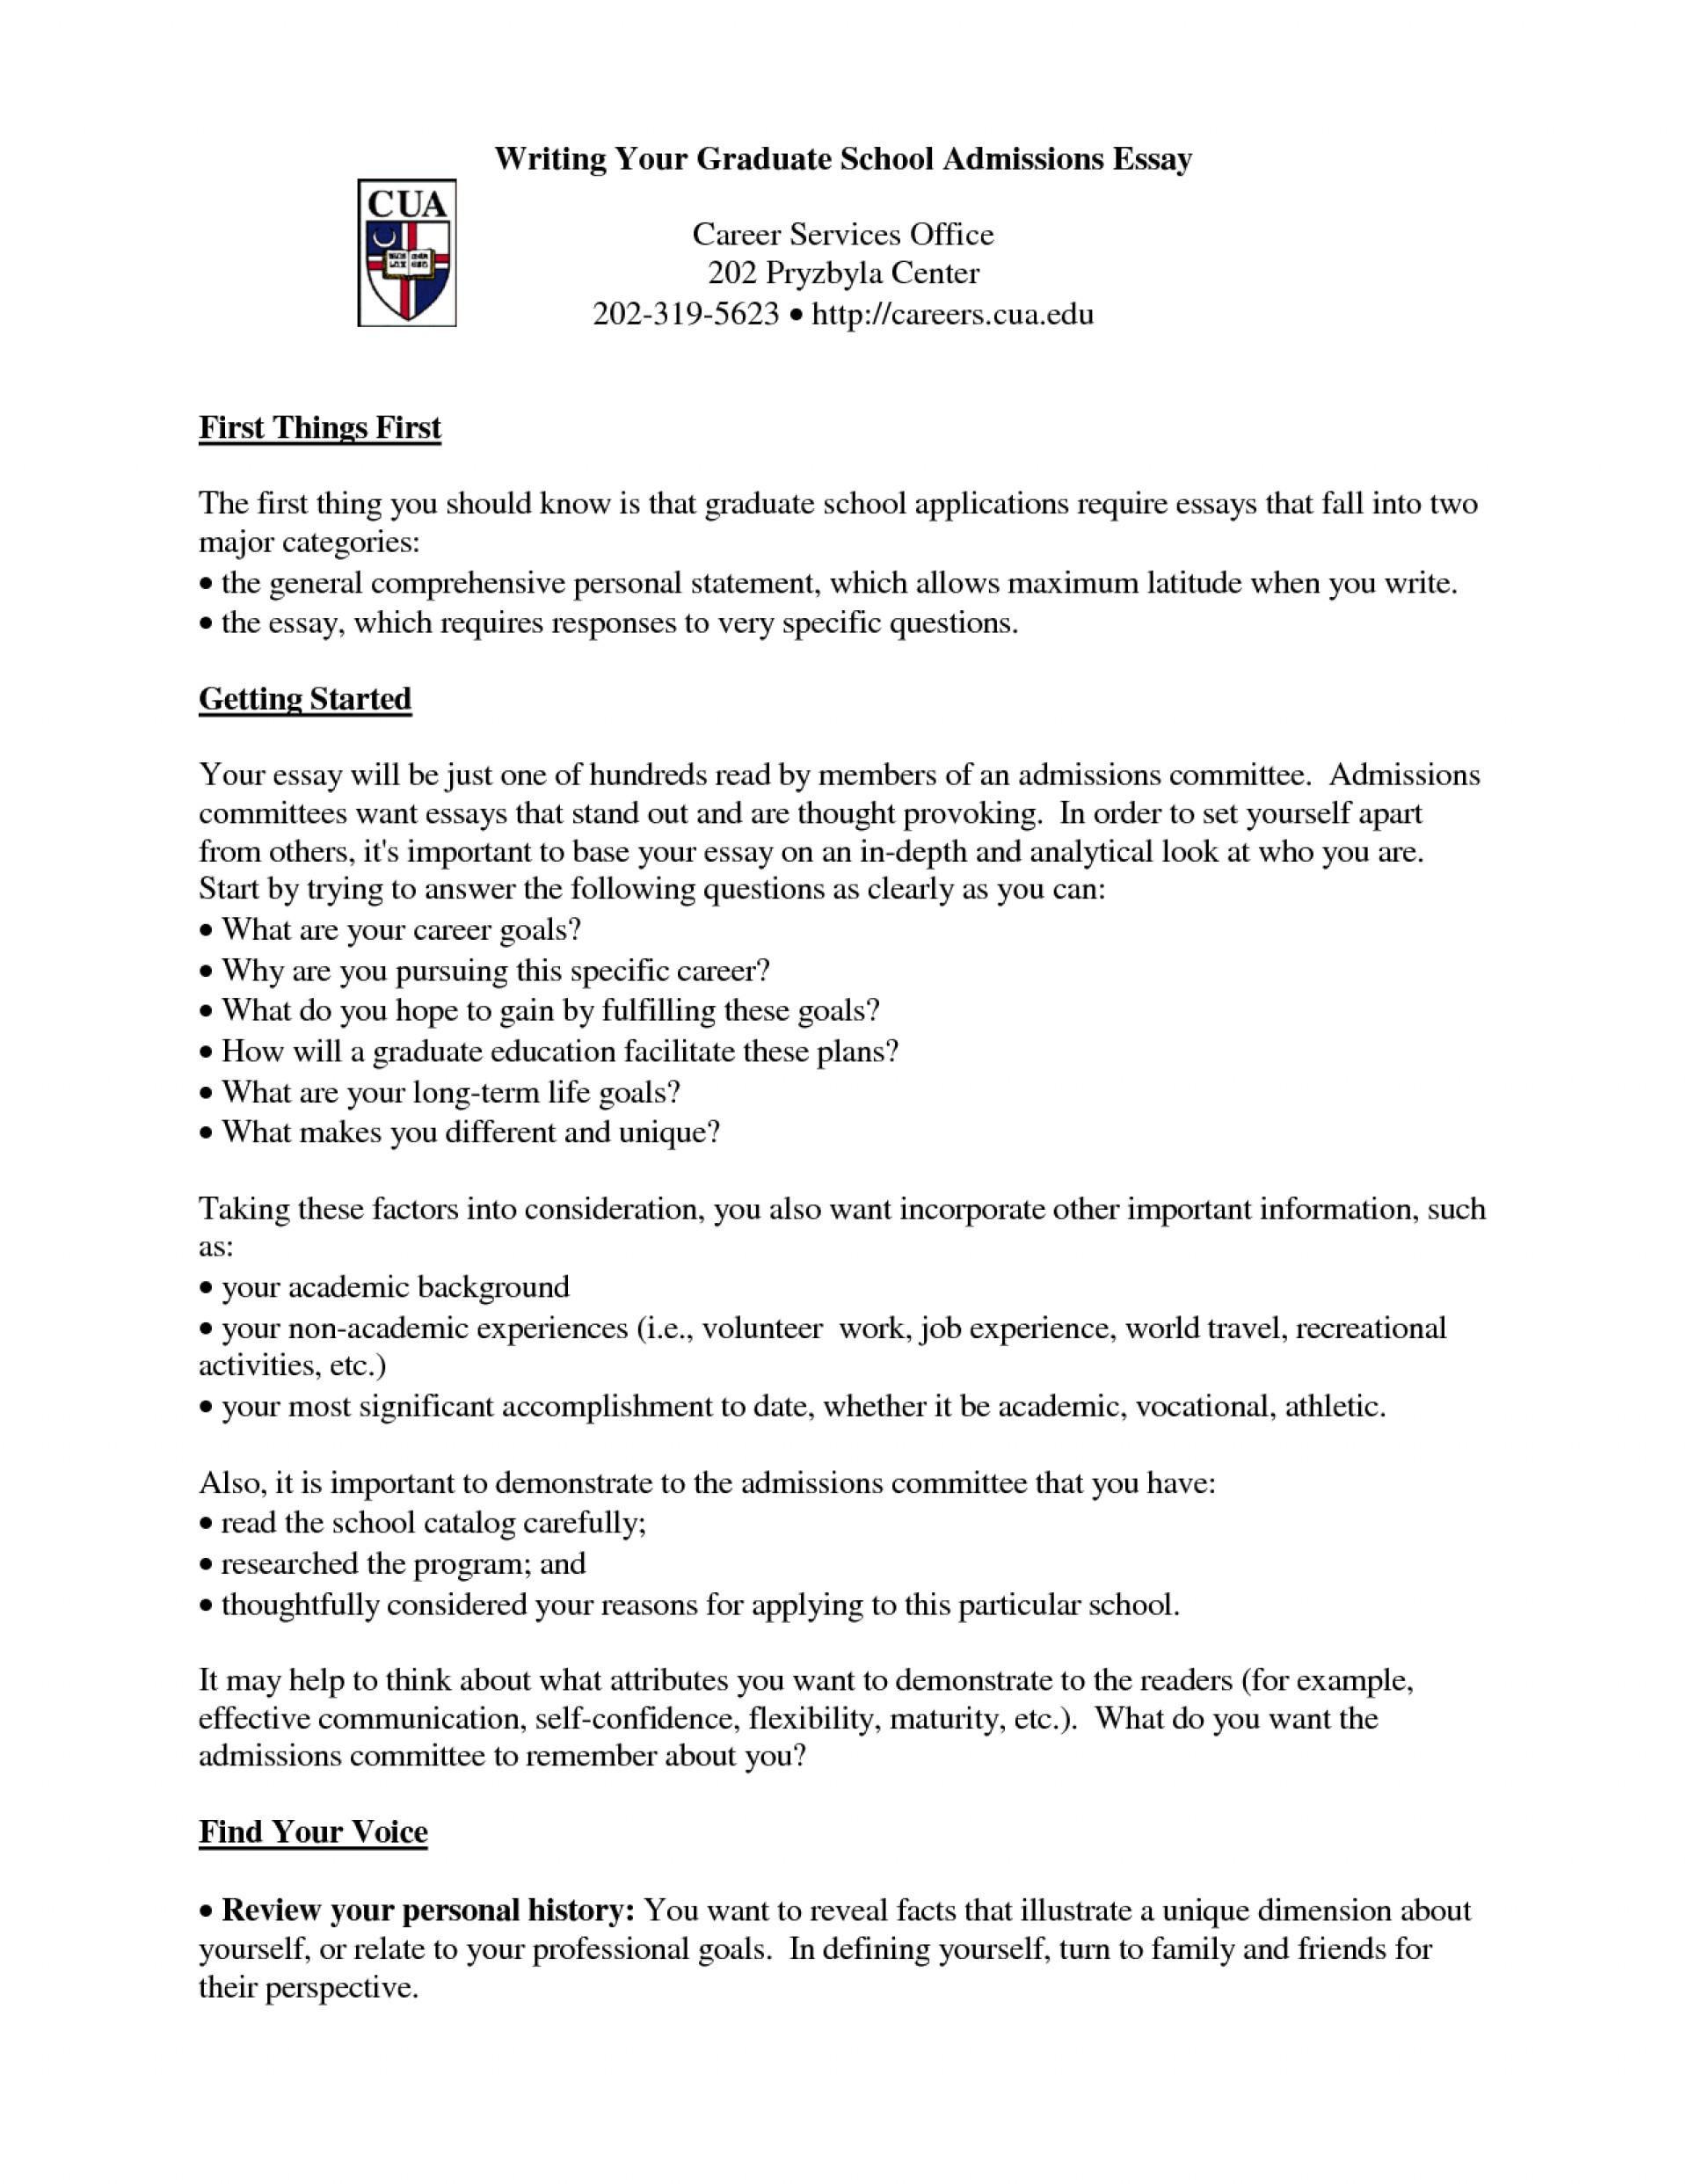 001 Graduate School Admission Essay Essaymedicalpersonalstatement615b0bd1 Frightening Social Work Format 1920